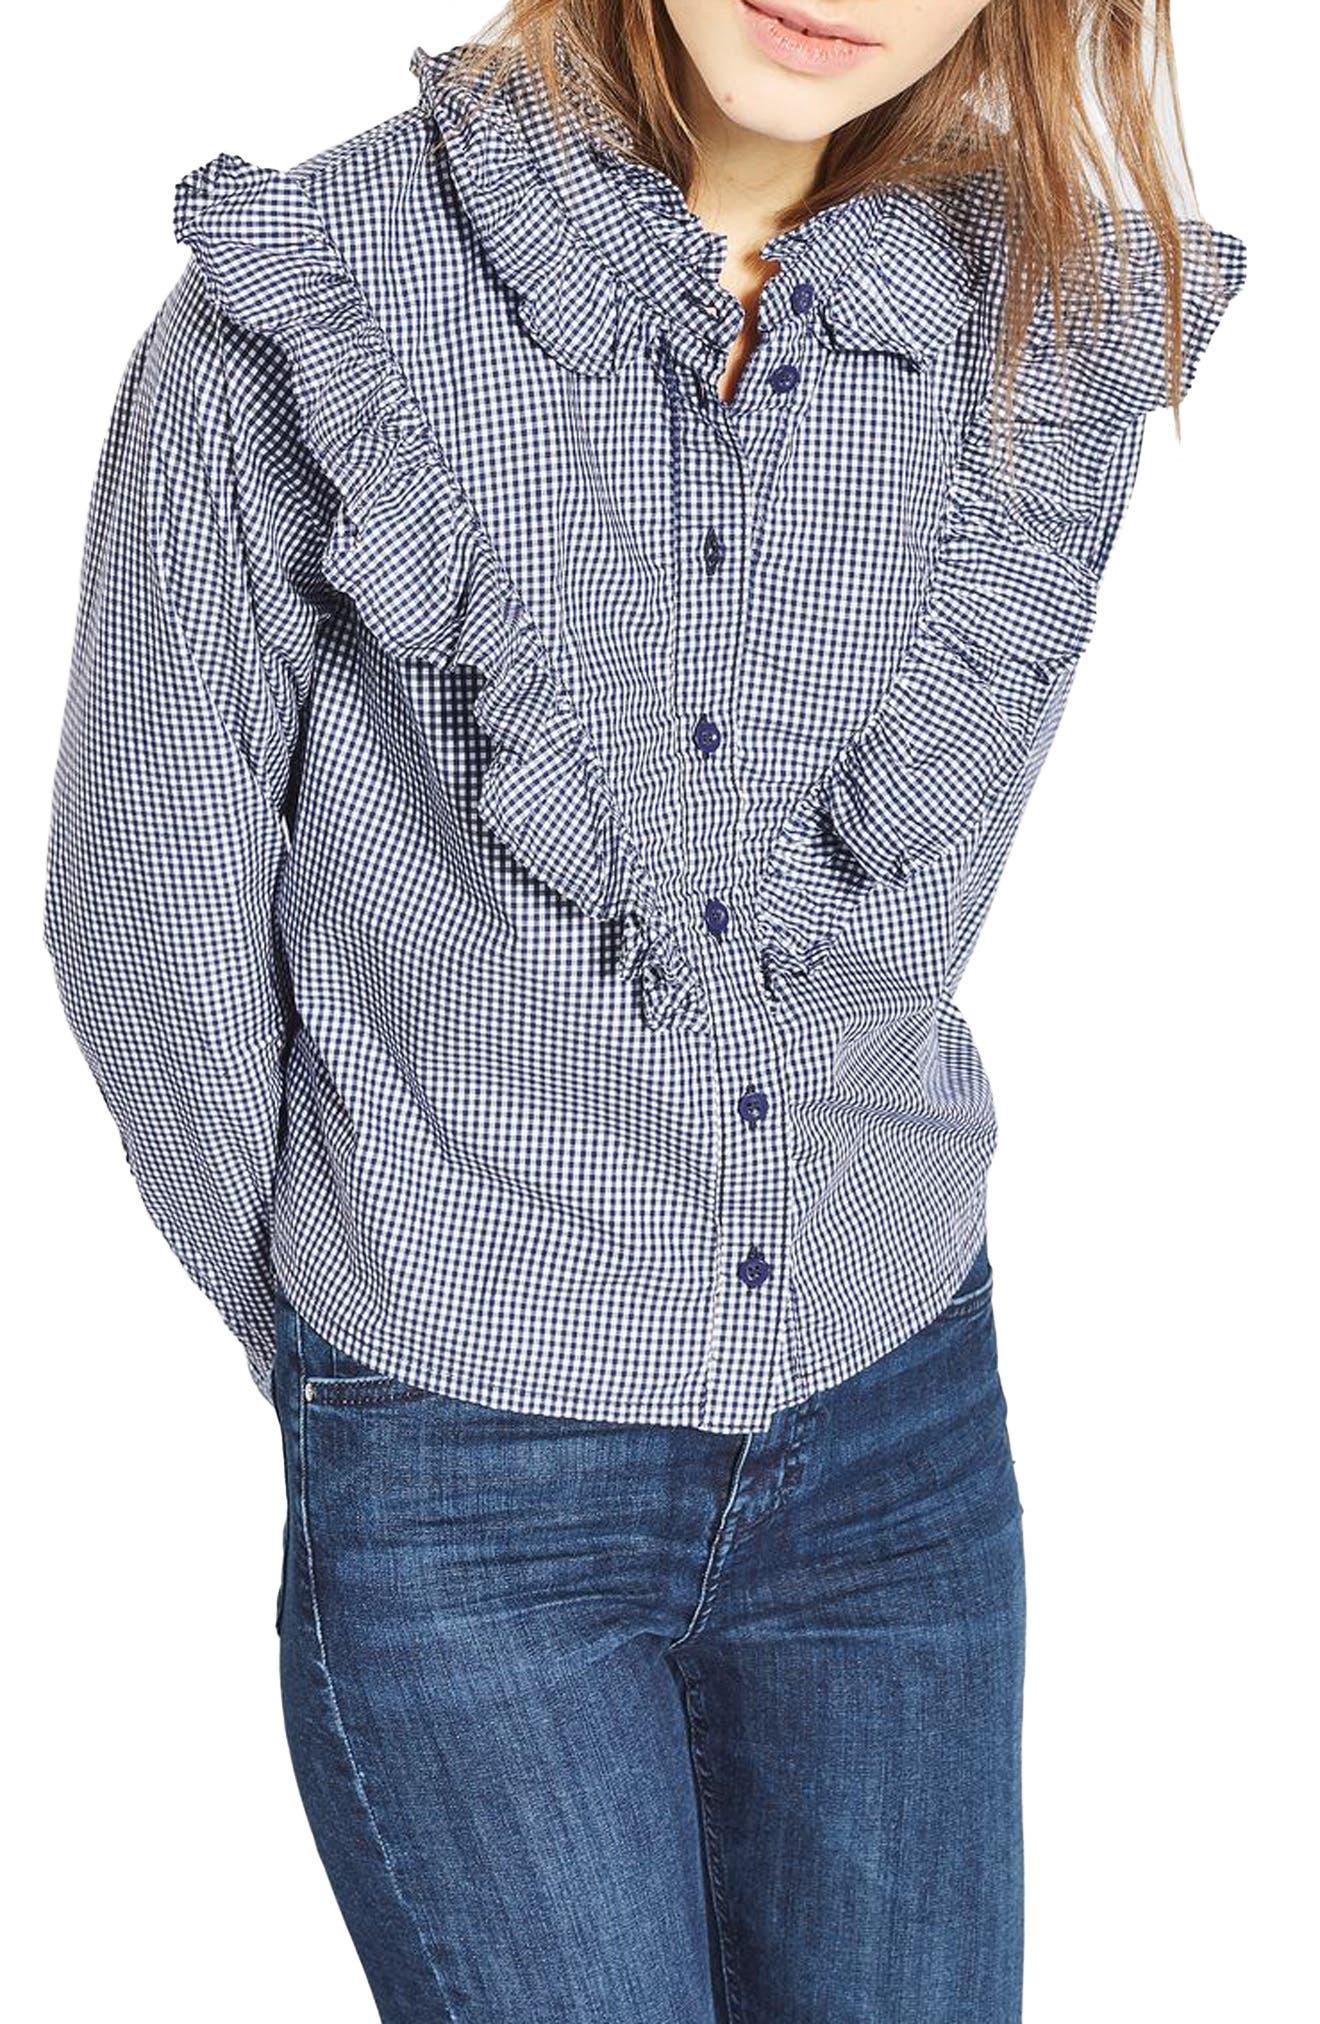 Alternate Image 1 Selected - Topshop Moto Ruffle Gingham Shirt